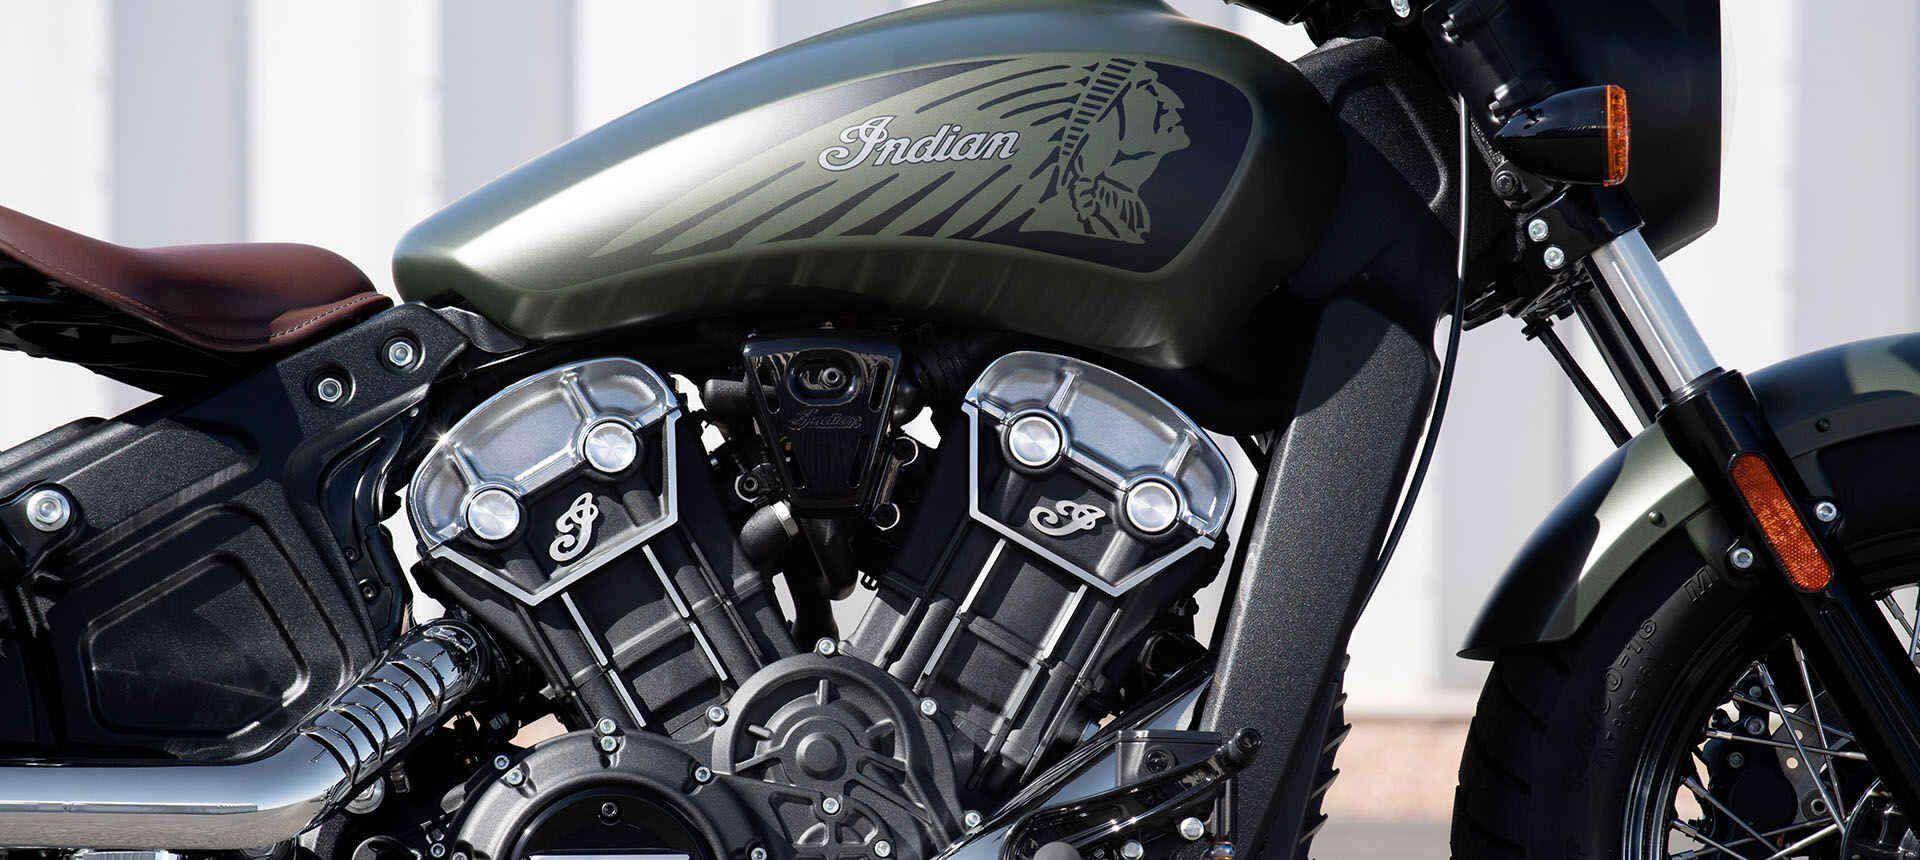 Мотоцикл Indian Scout Bobber Twenty Sagebrush Smoke 2020 - 3